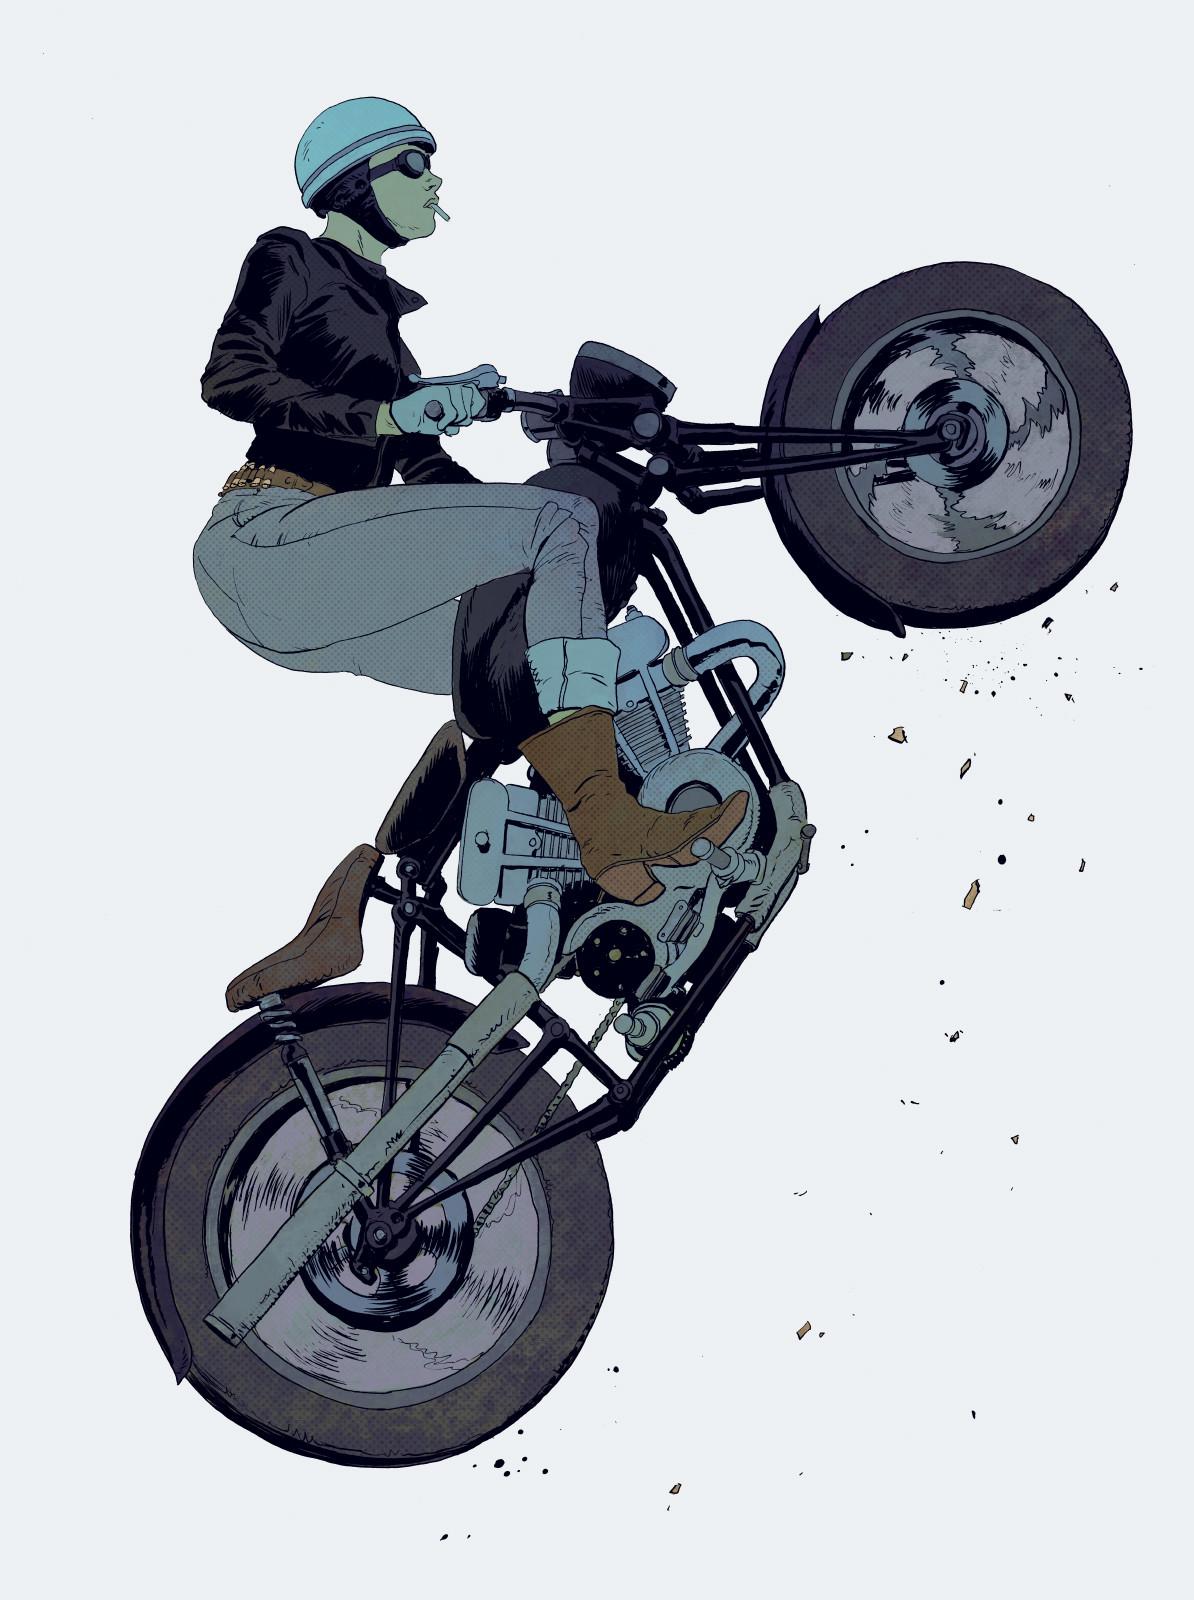 robert-sammelin-bikejump.jpg